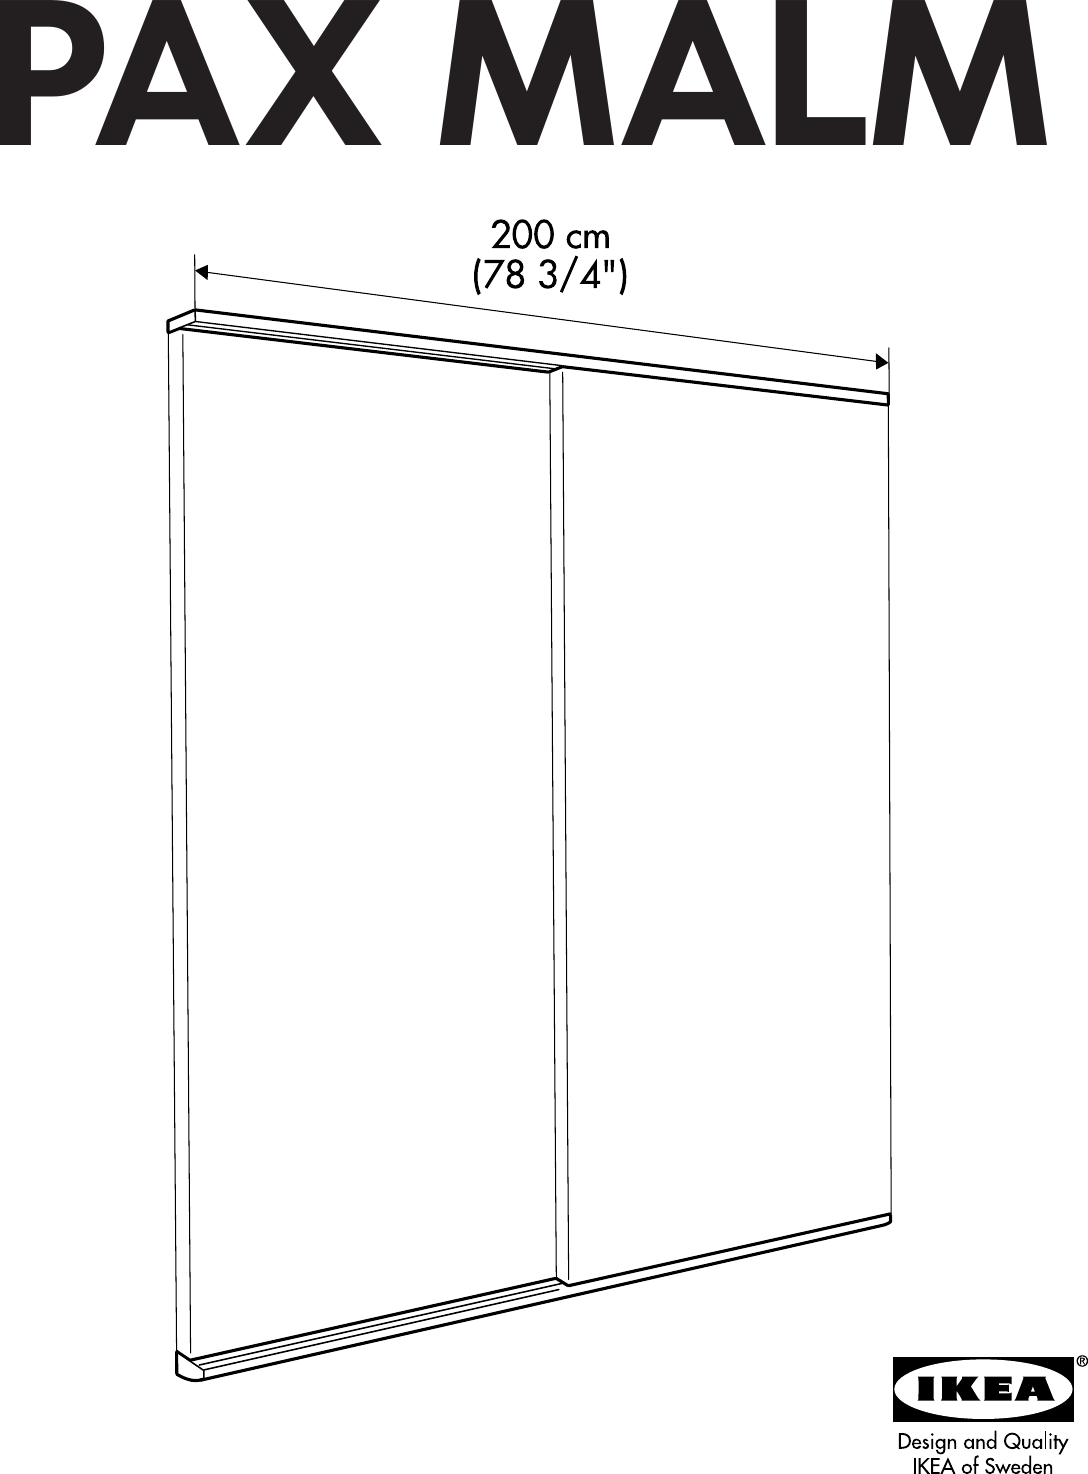 Ikea Pax Malm Guide Rail 79x79 Assembly Instruction